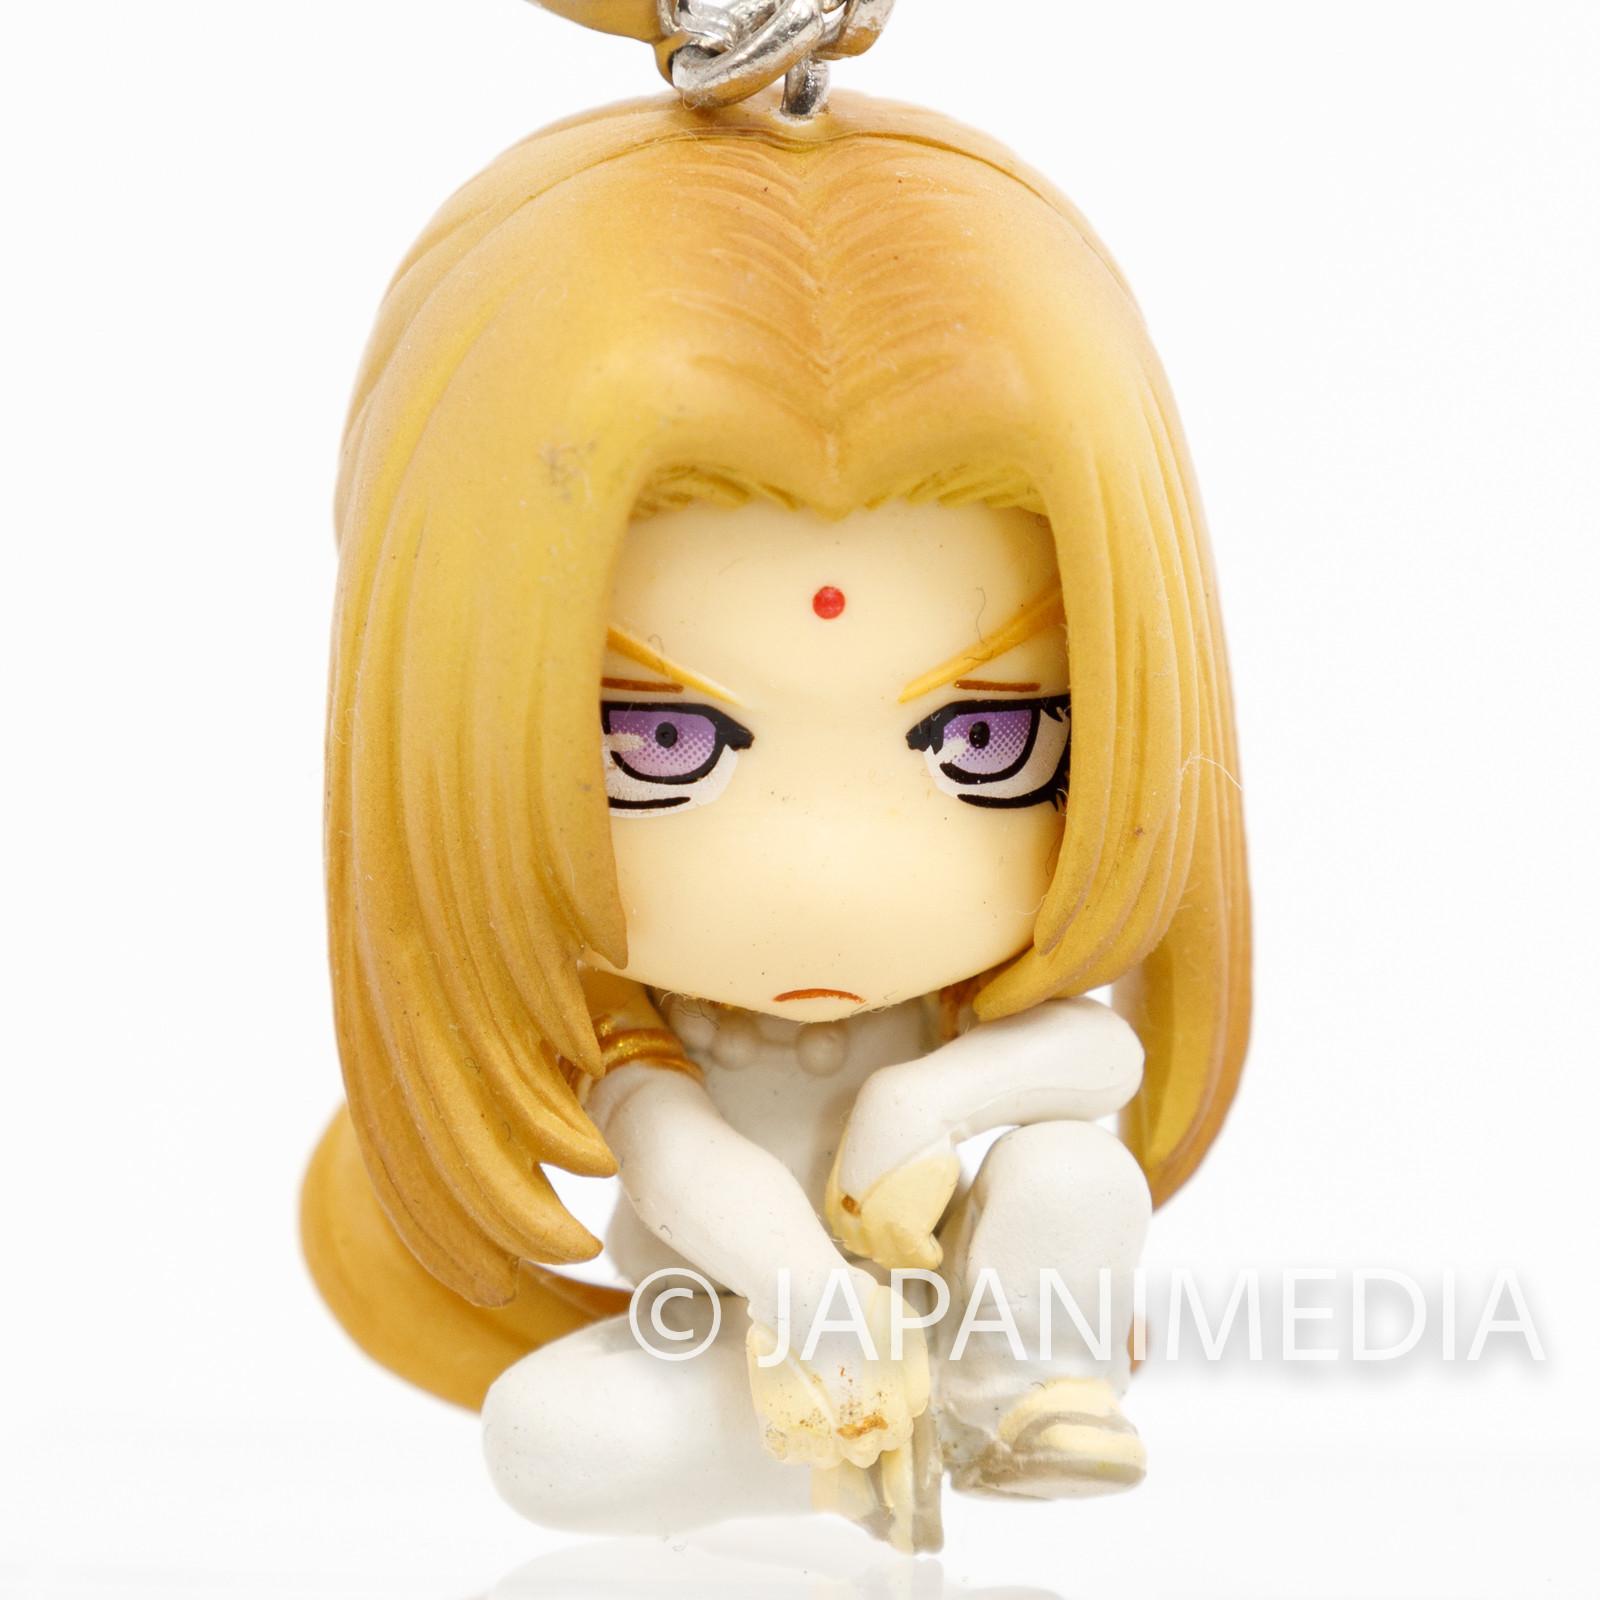 SAIYUKI Konzen Douji KaraCole Mascot Figure Movic Kazuya Minekura JAPAN